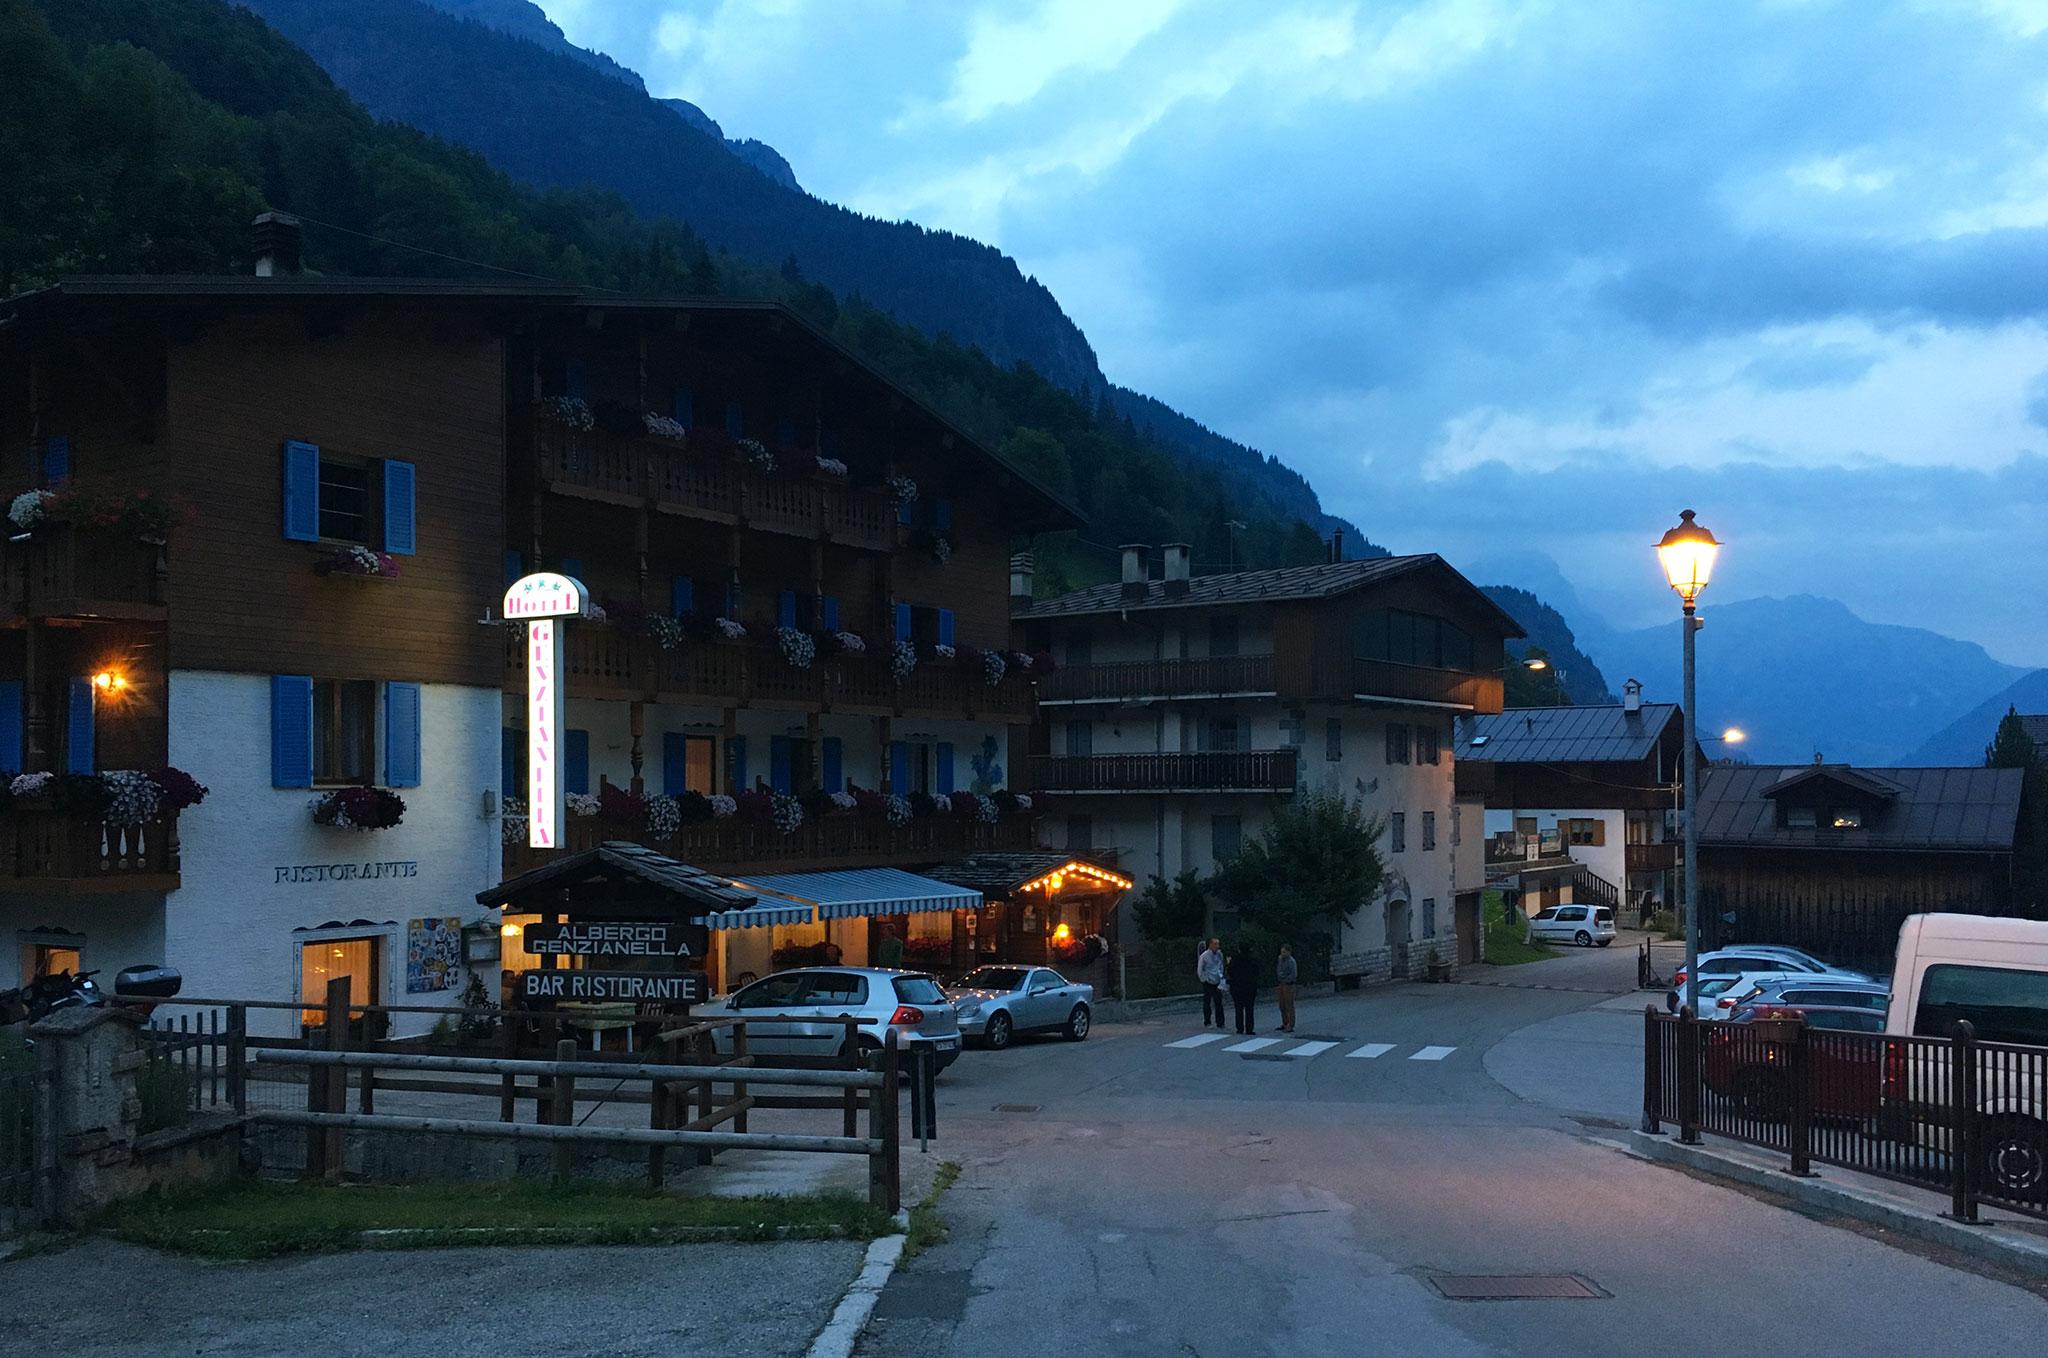 Hotel Albergo Gianzinella in Sottoguda by night